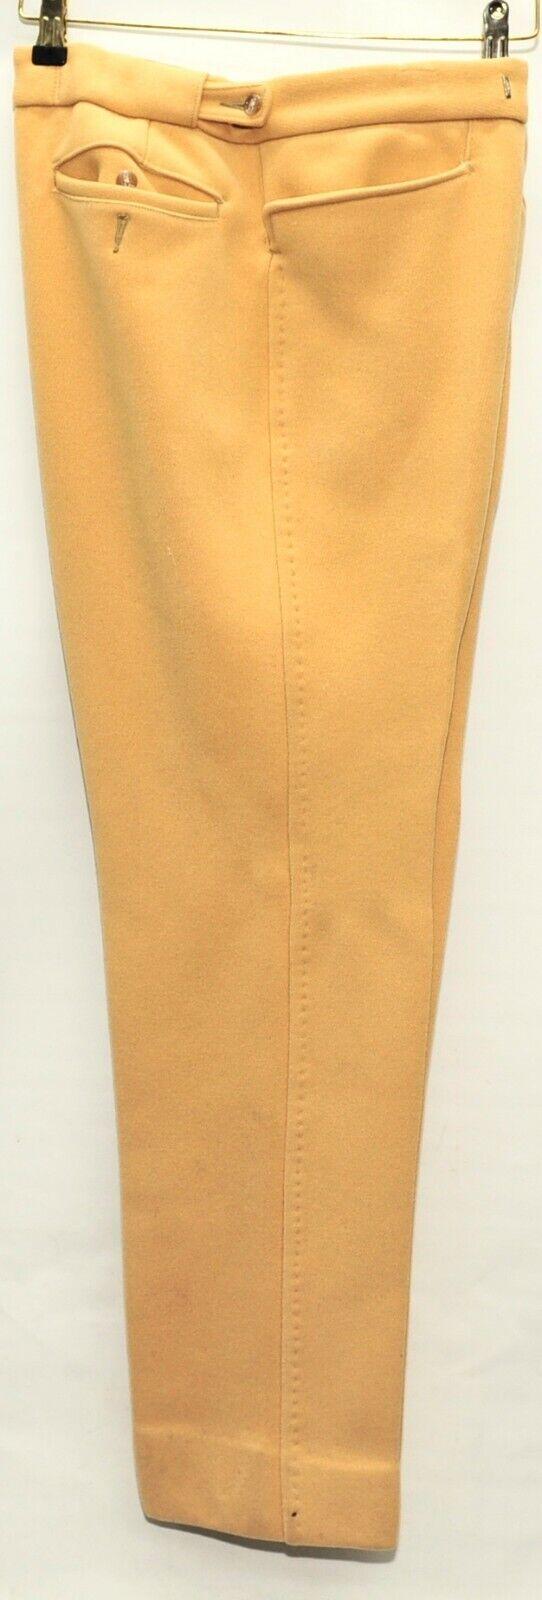 John brockelhurst Peso Pesado Sarga de caballería  Crema Pantalones Tamaño 30  W 30  L  estar en gran demanda